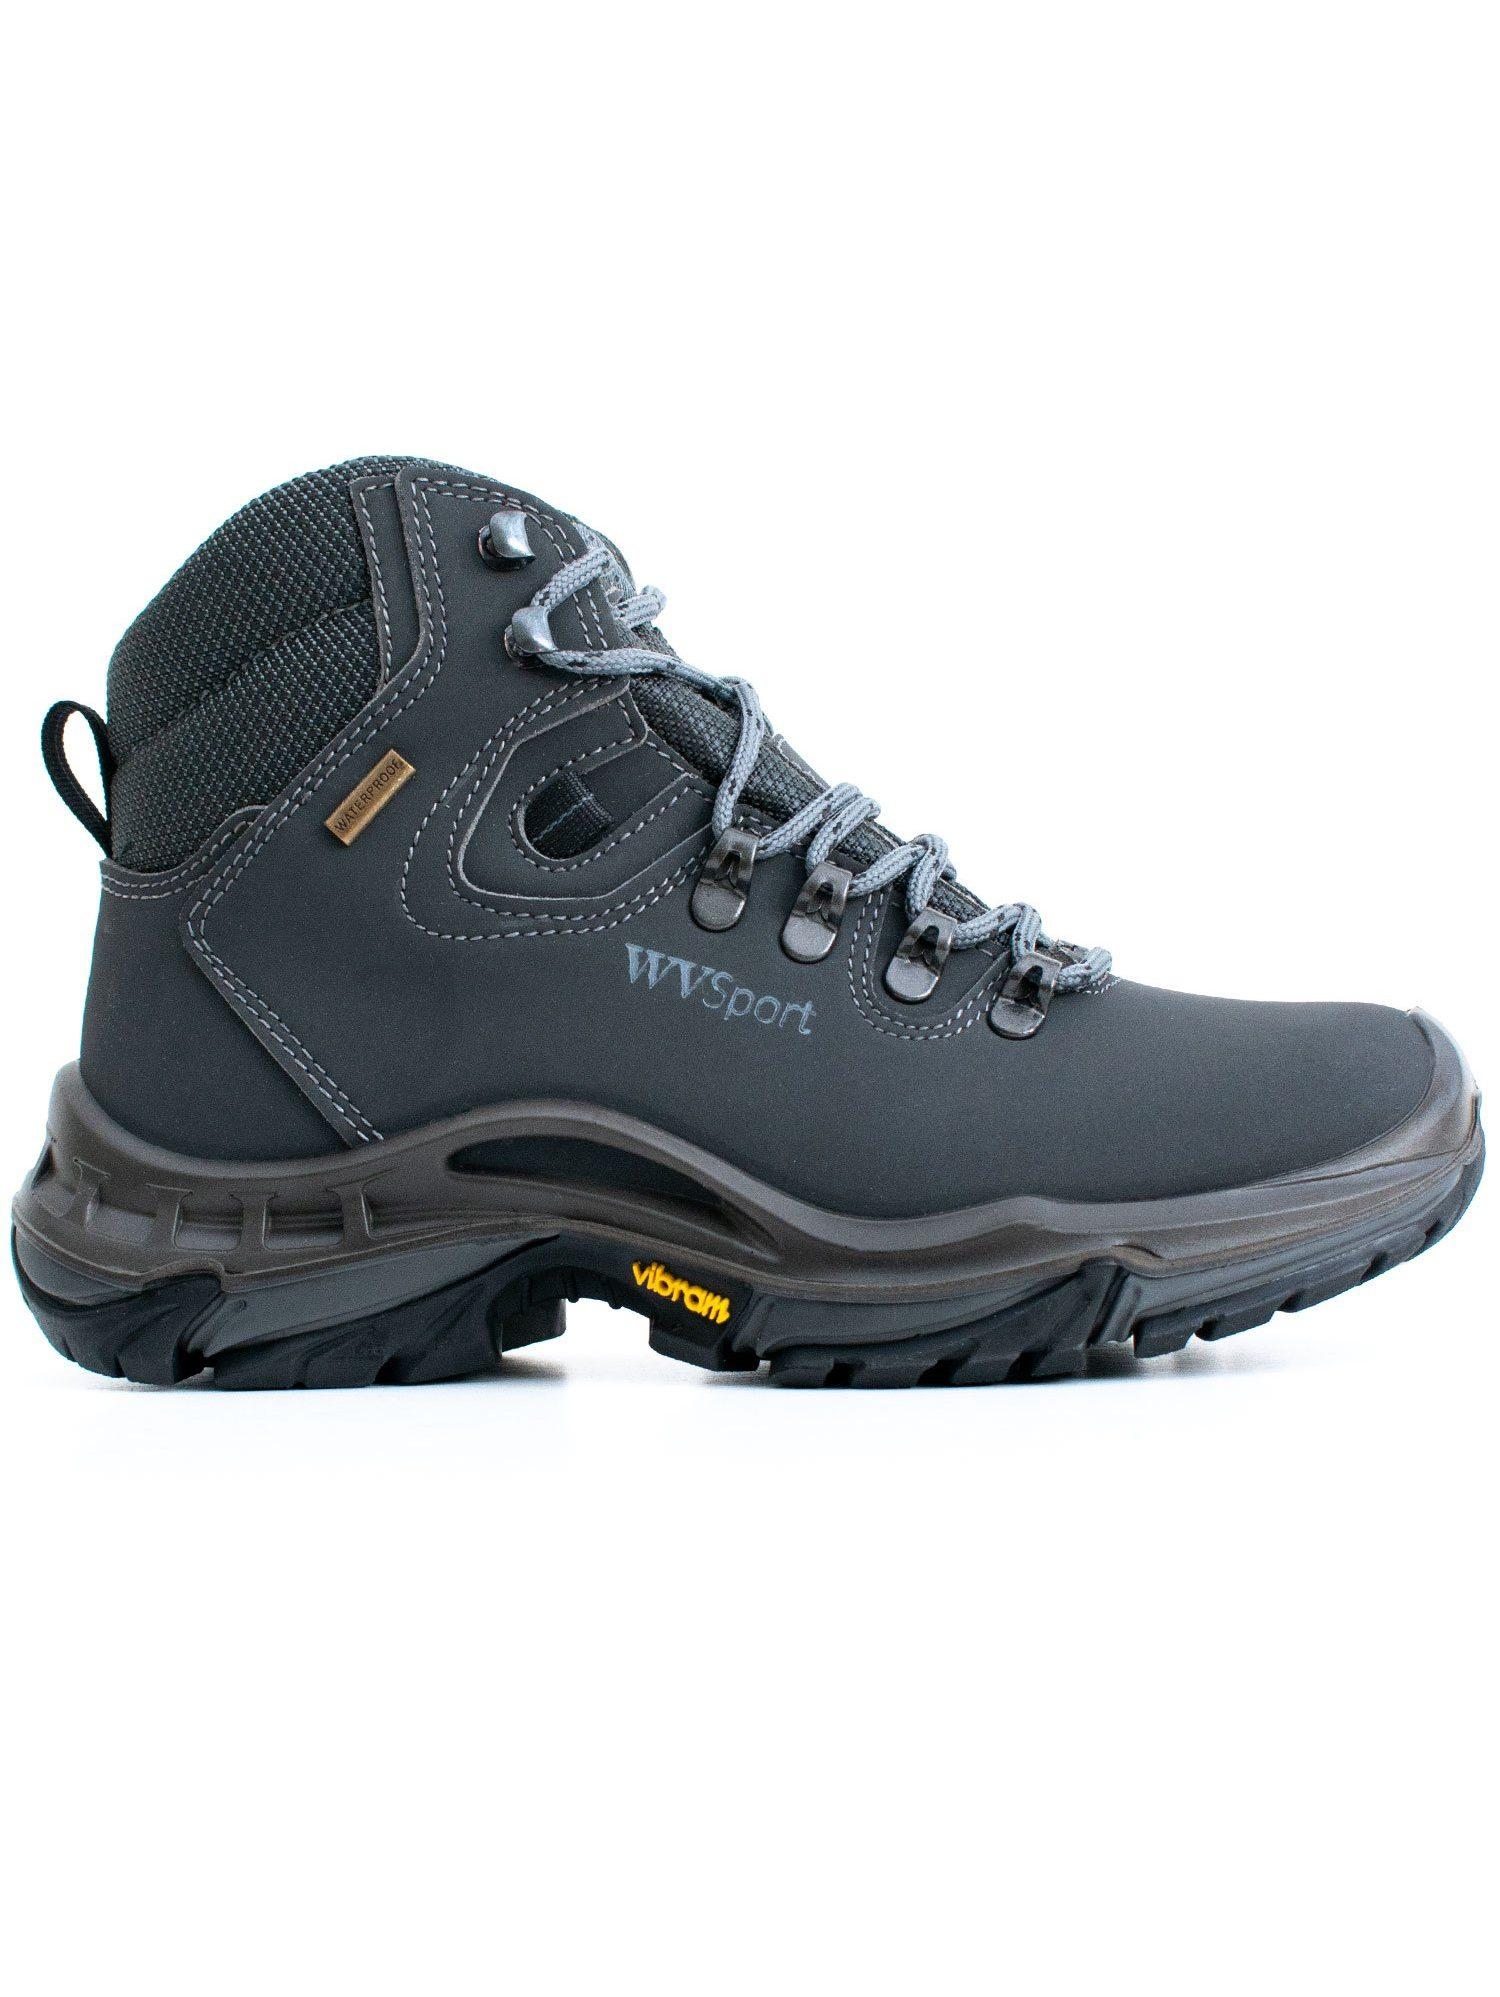 Will's Vegan Shoes Vegan Hiking Boots